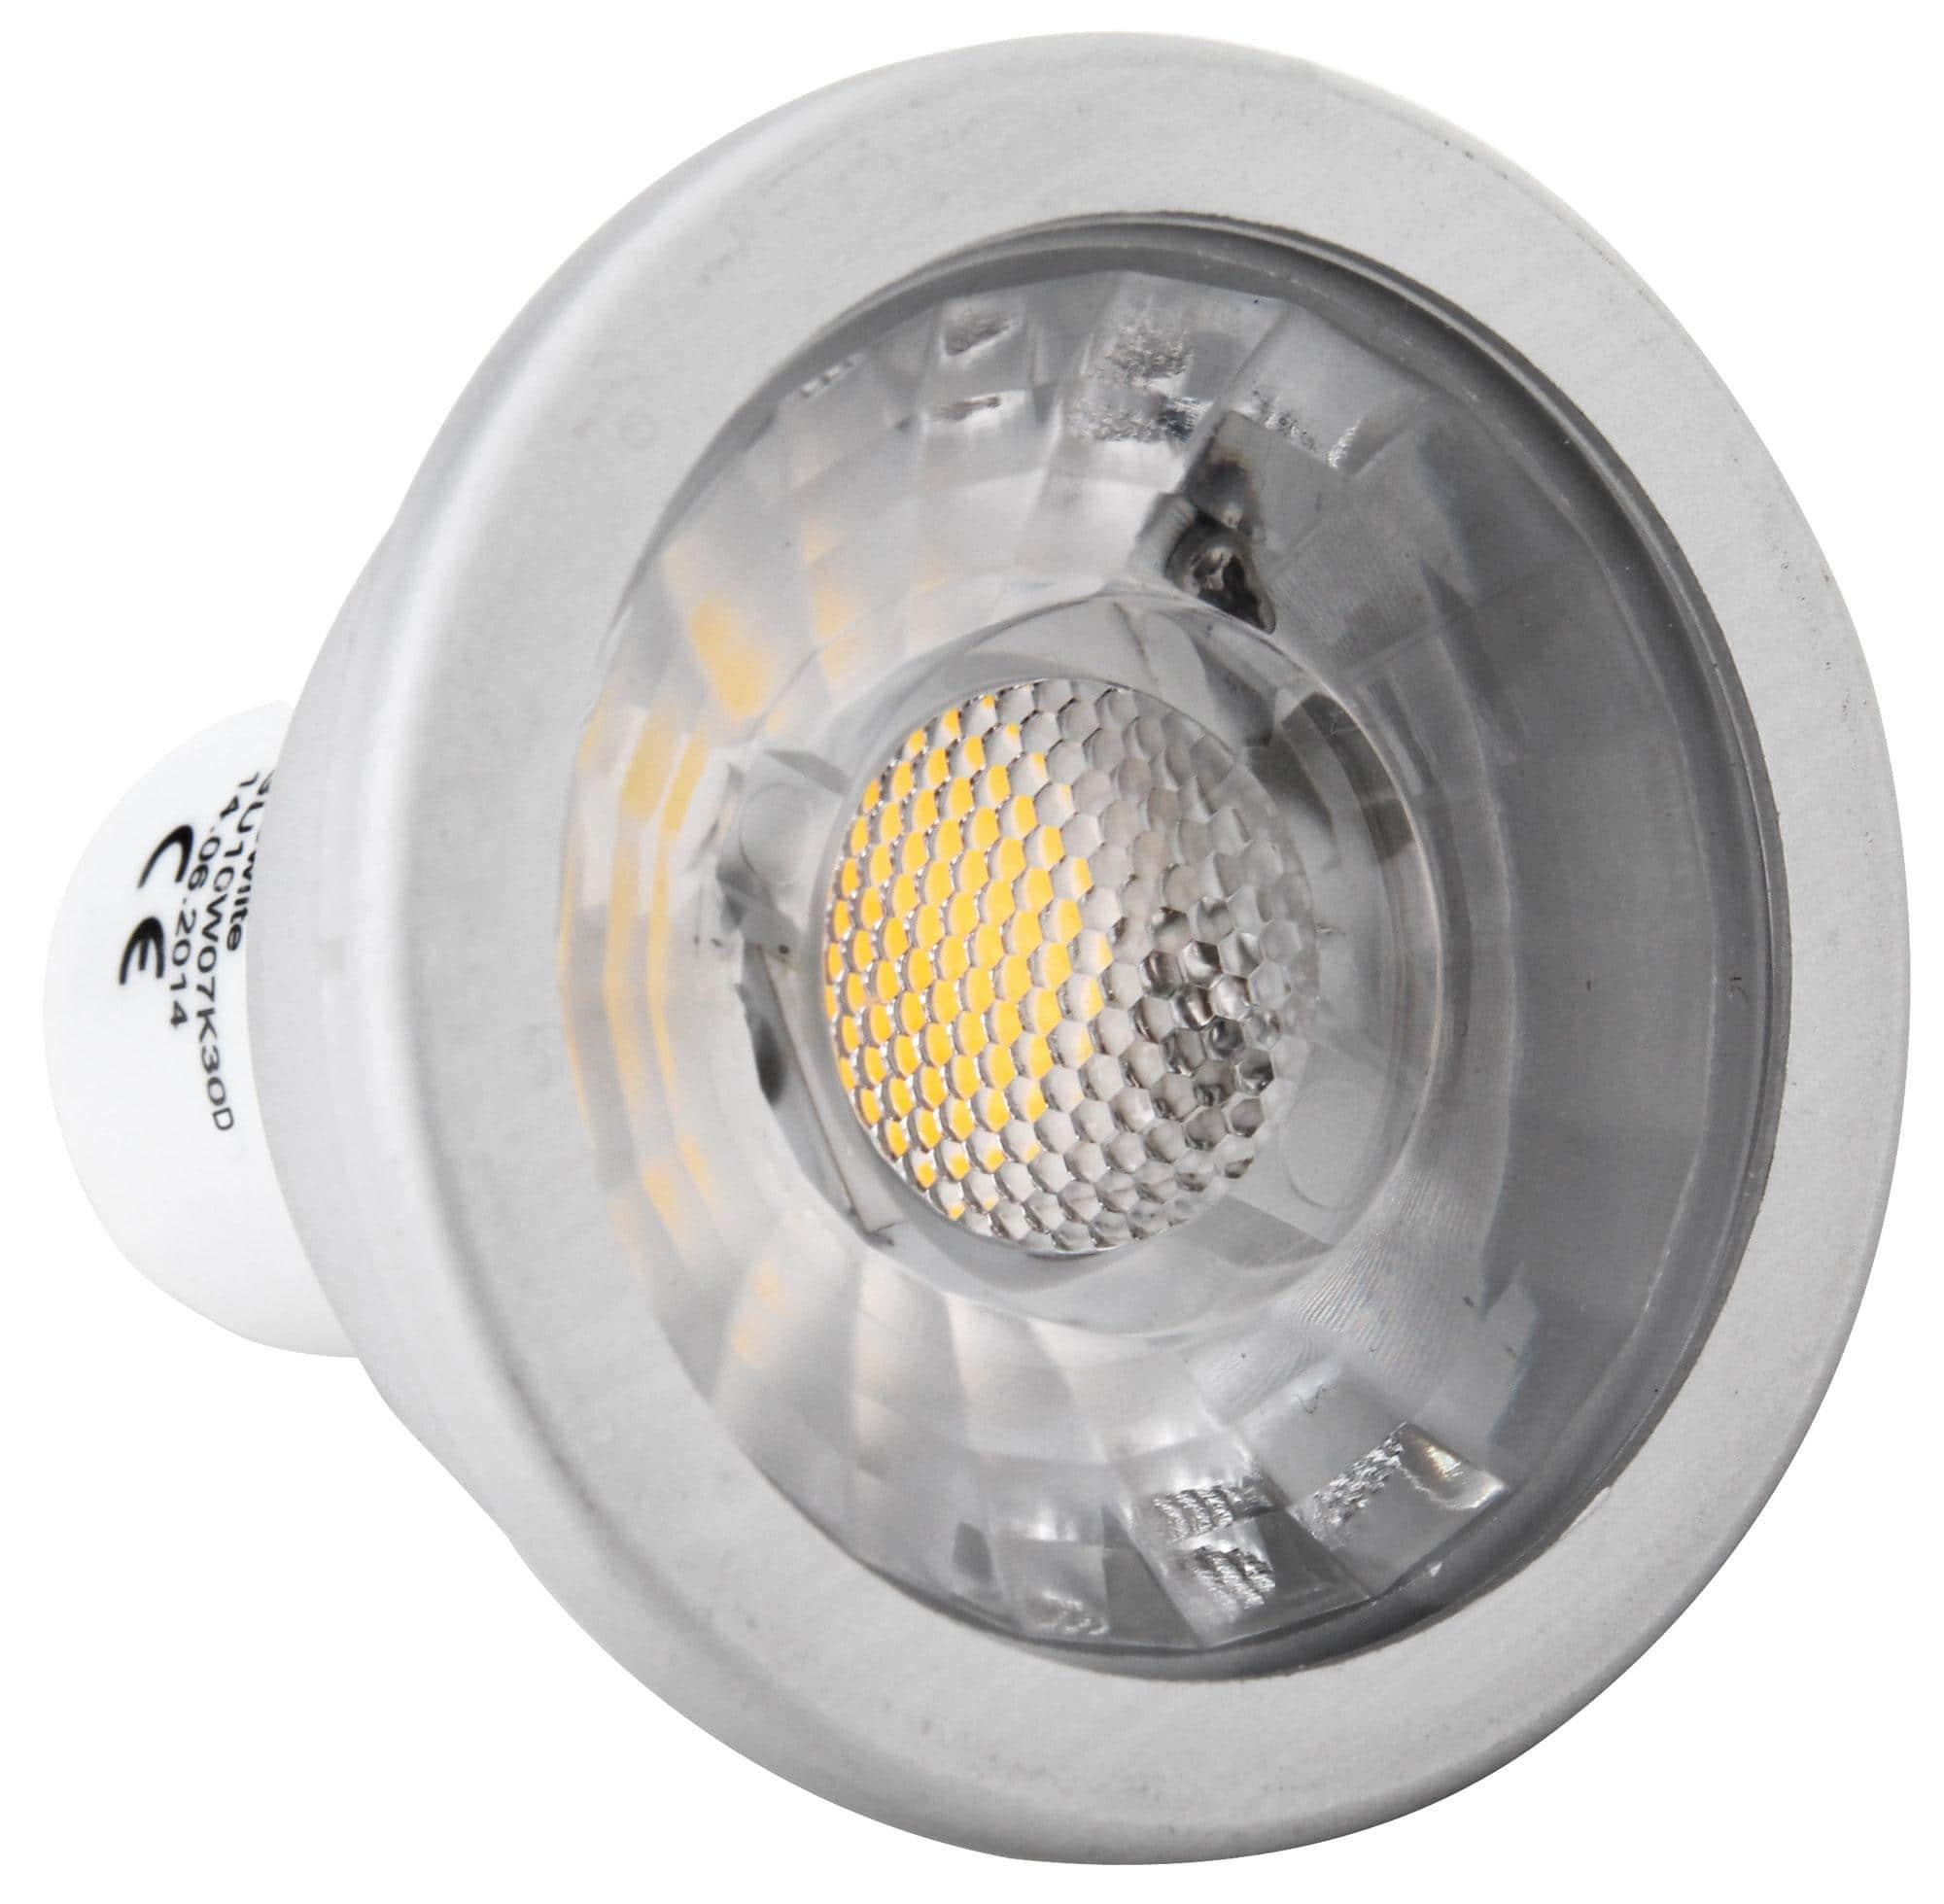 showlite led spot cob gu10w07k30d 7 watt 550 lumen. Black Bedroom Furniture Sets. Home Design Ideas